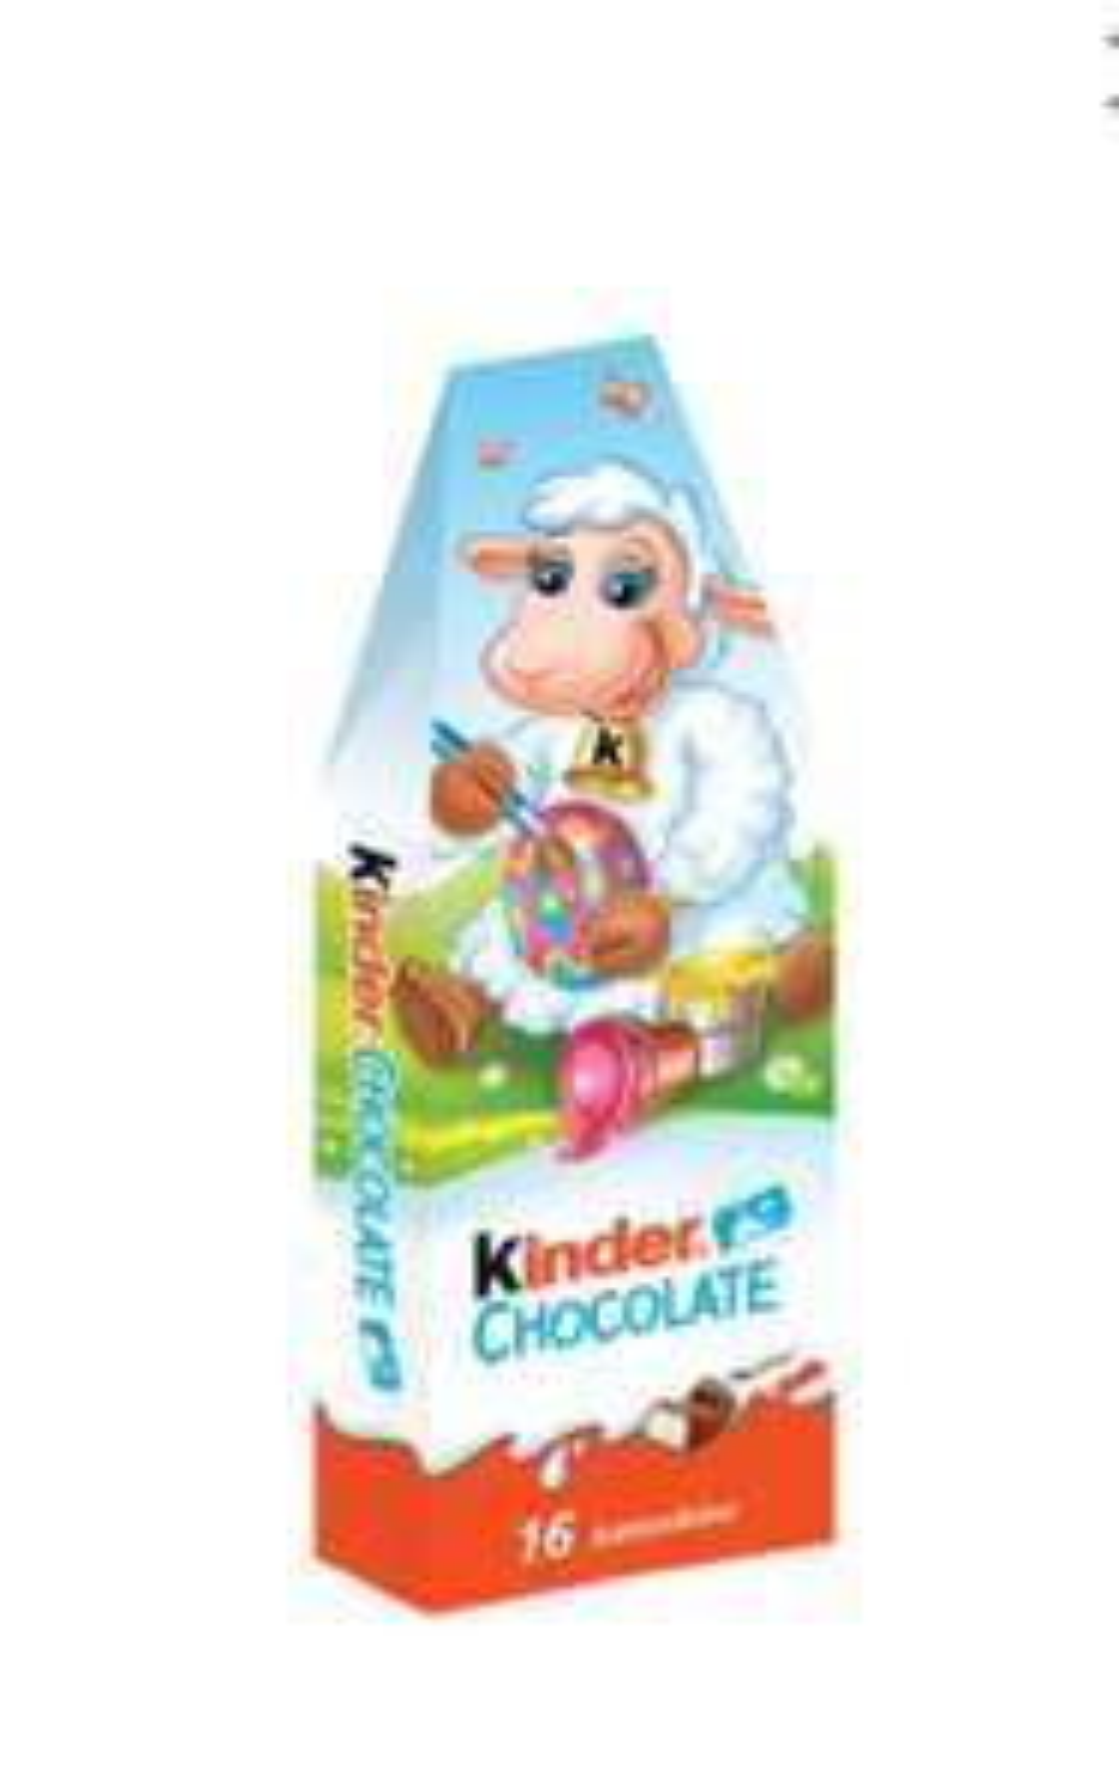 Kinder Chocolate - Lidl - Radom